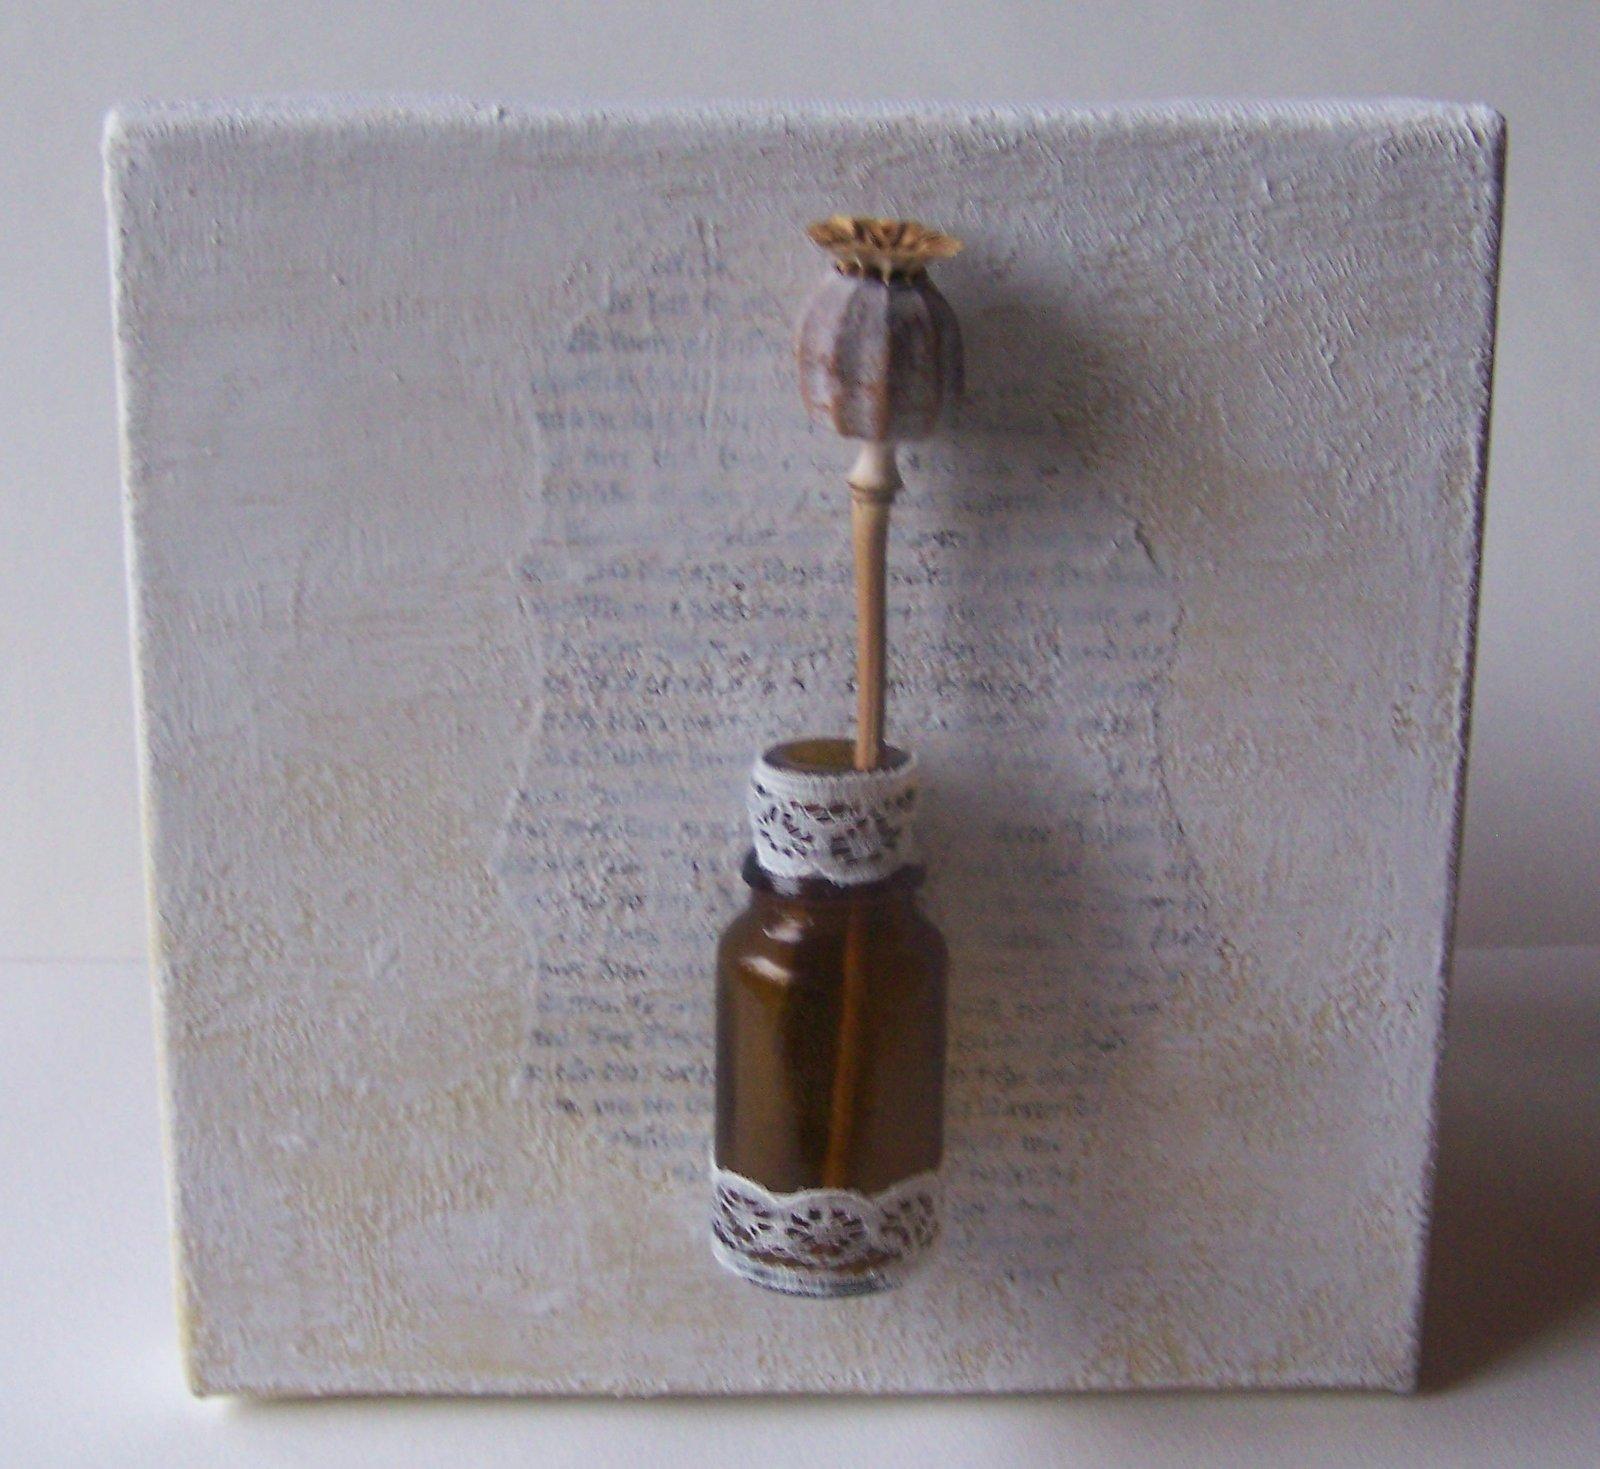 Acryl Keilrahmen Mit Vase Und Mohnkapsel